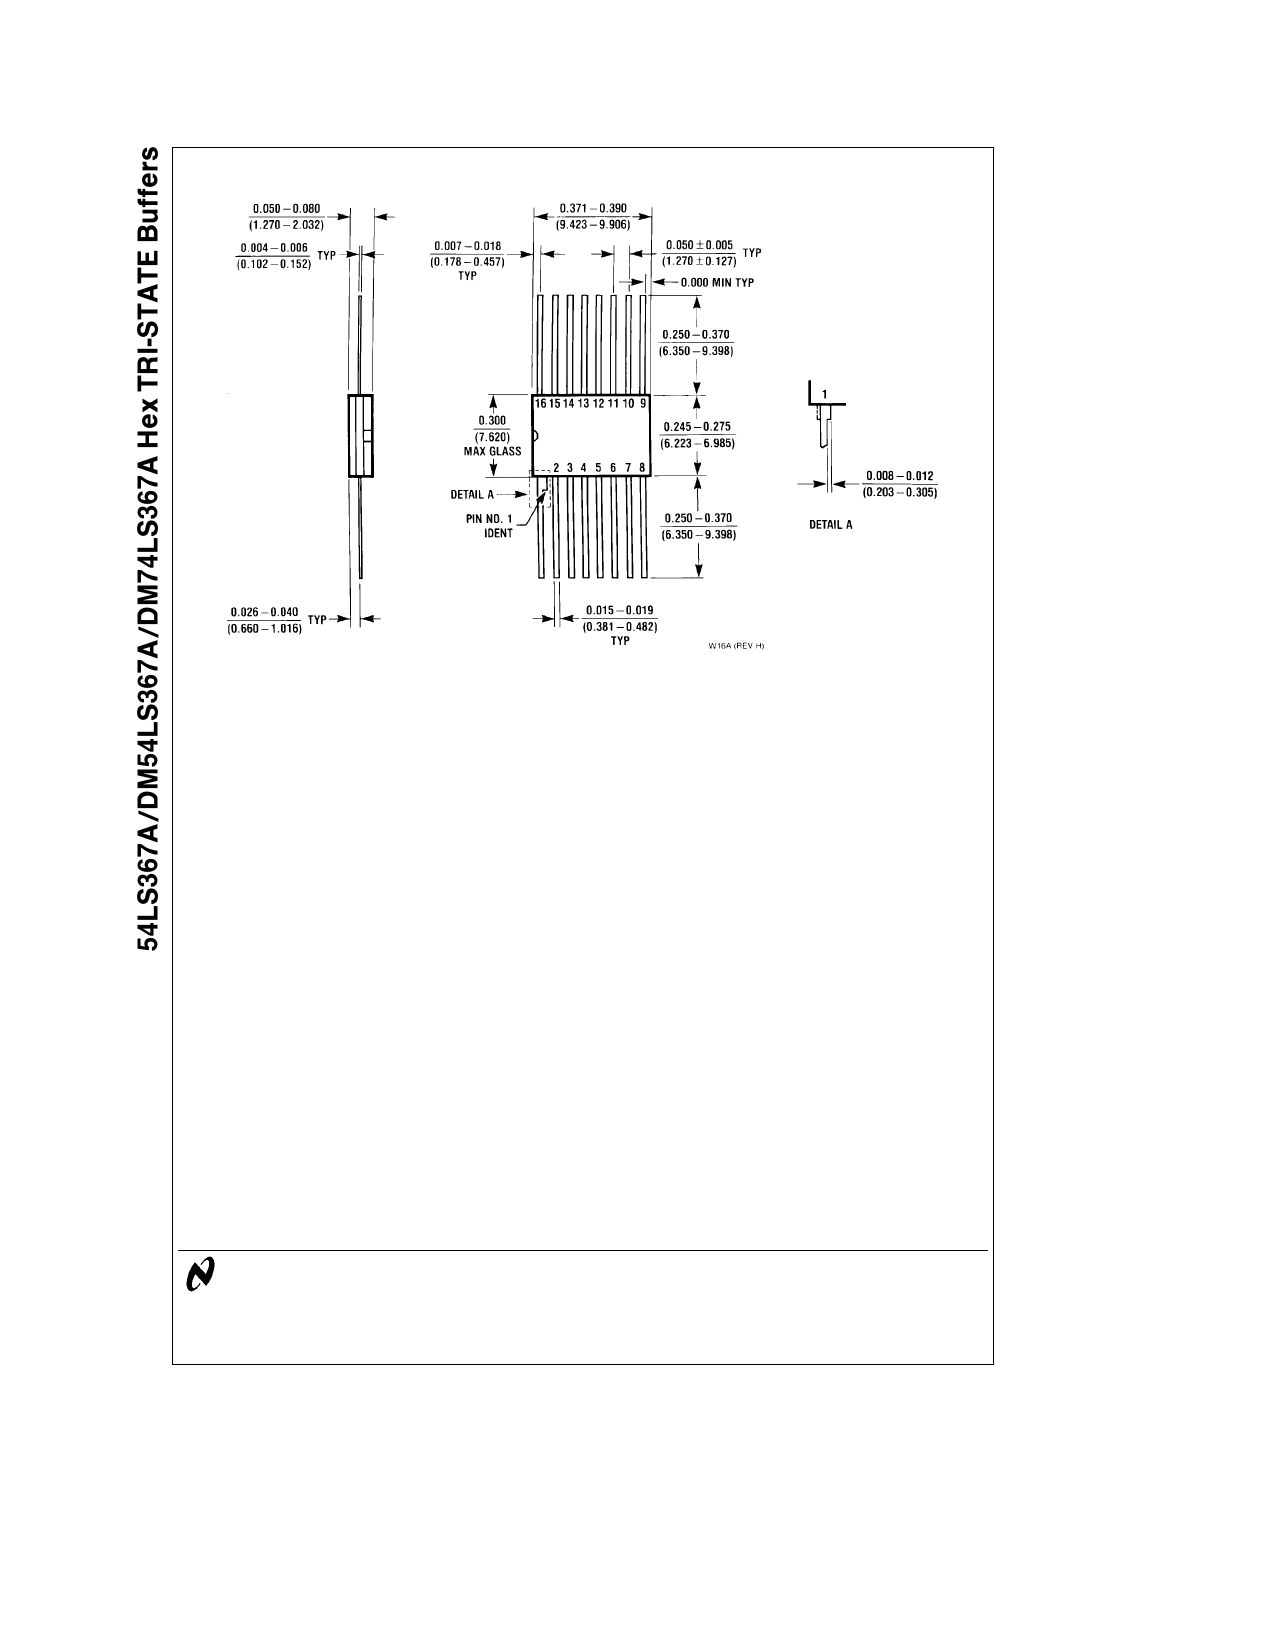 54LS367A 電子部品, 半導体